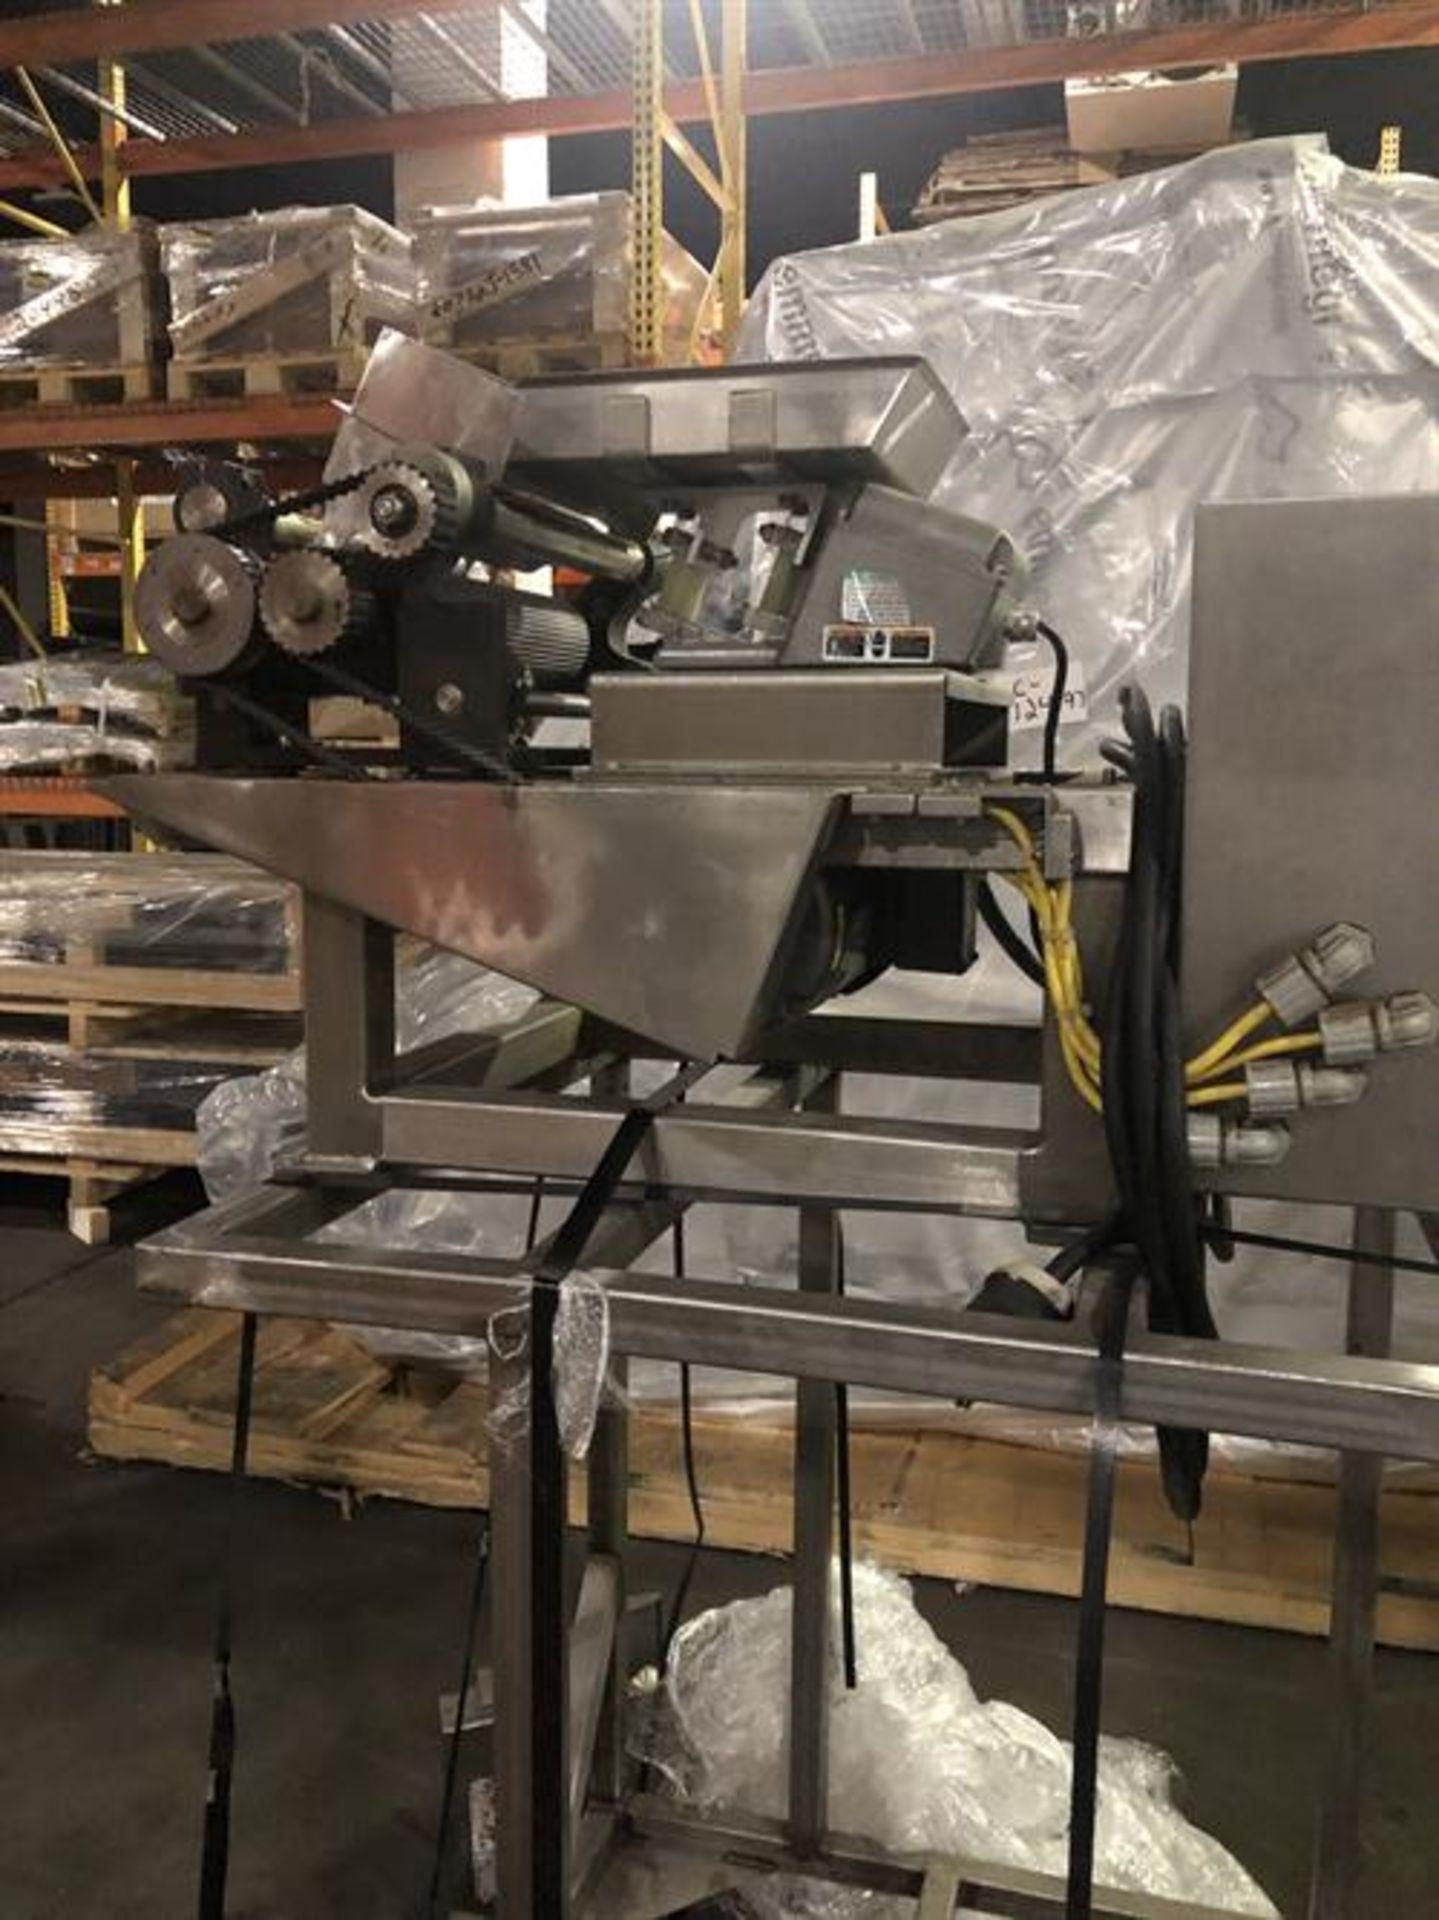 Urschel model N Stainless Steel Granulator - Vibrator pan feeder with variable speed rheostat - - Image 6 of 18